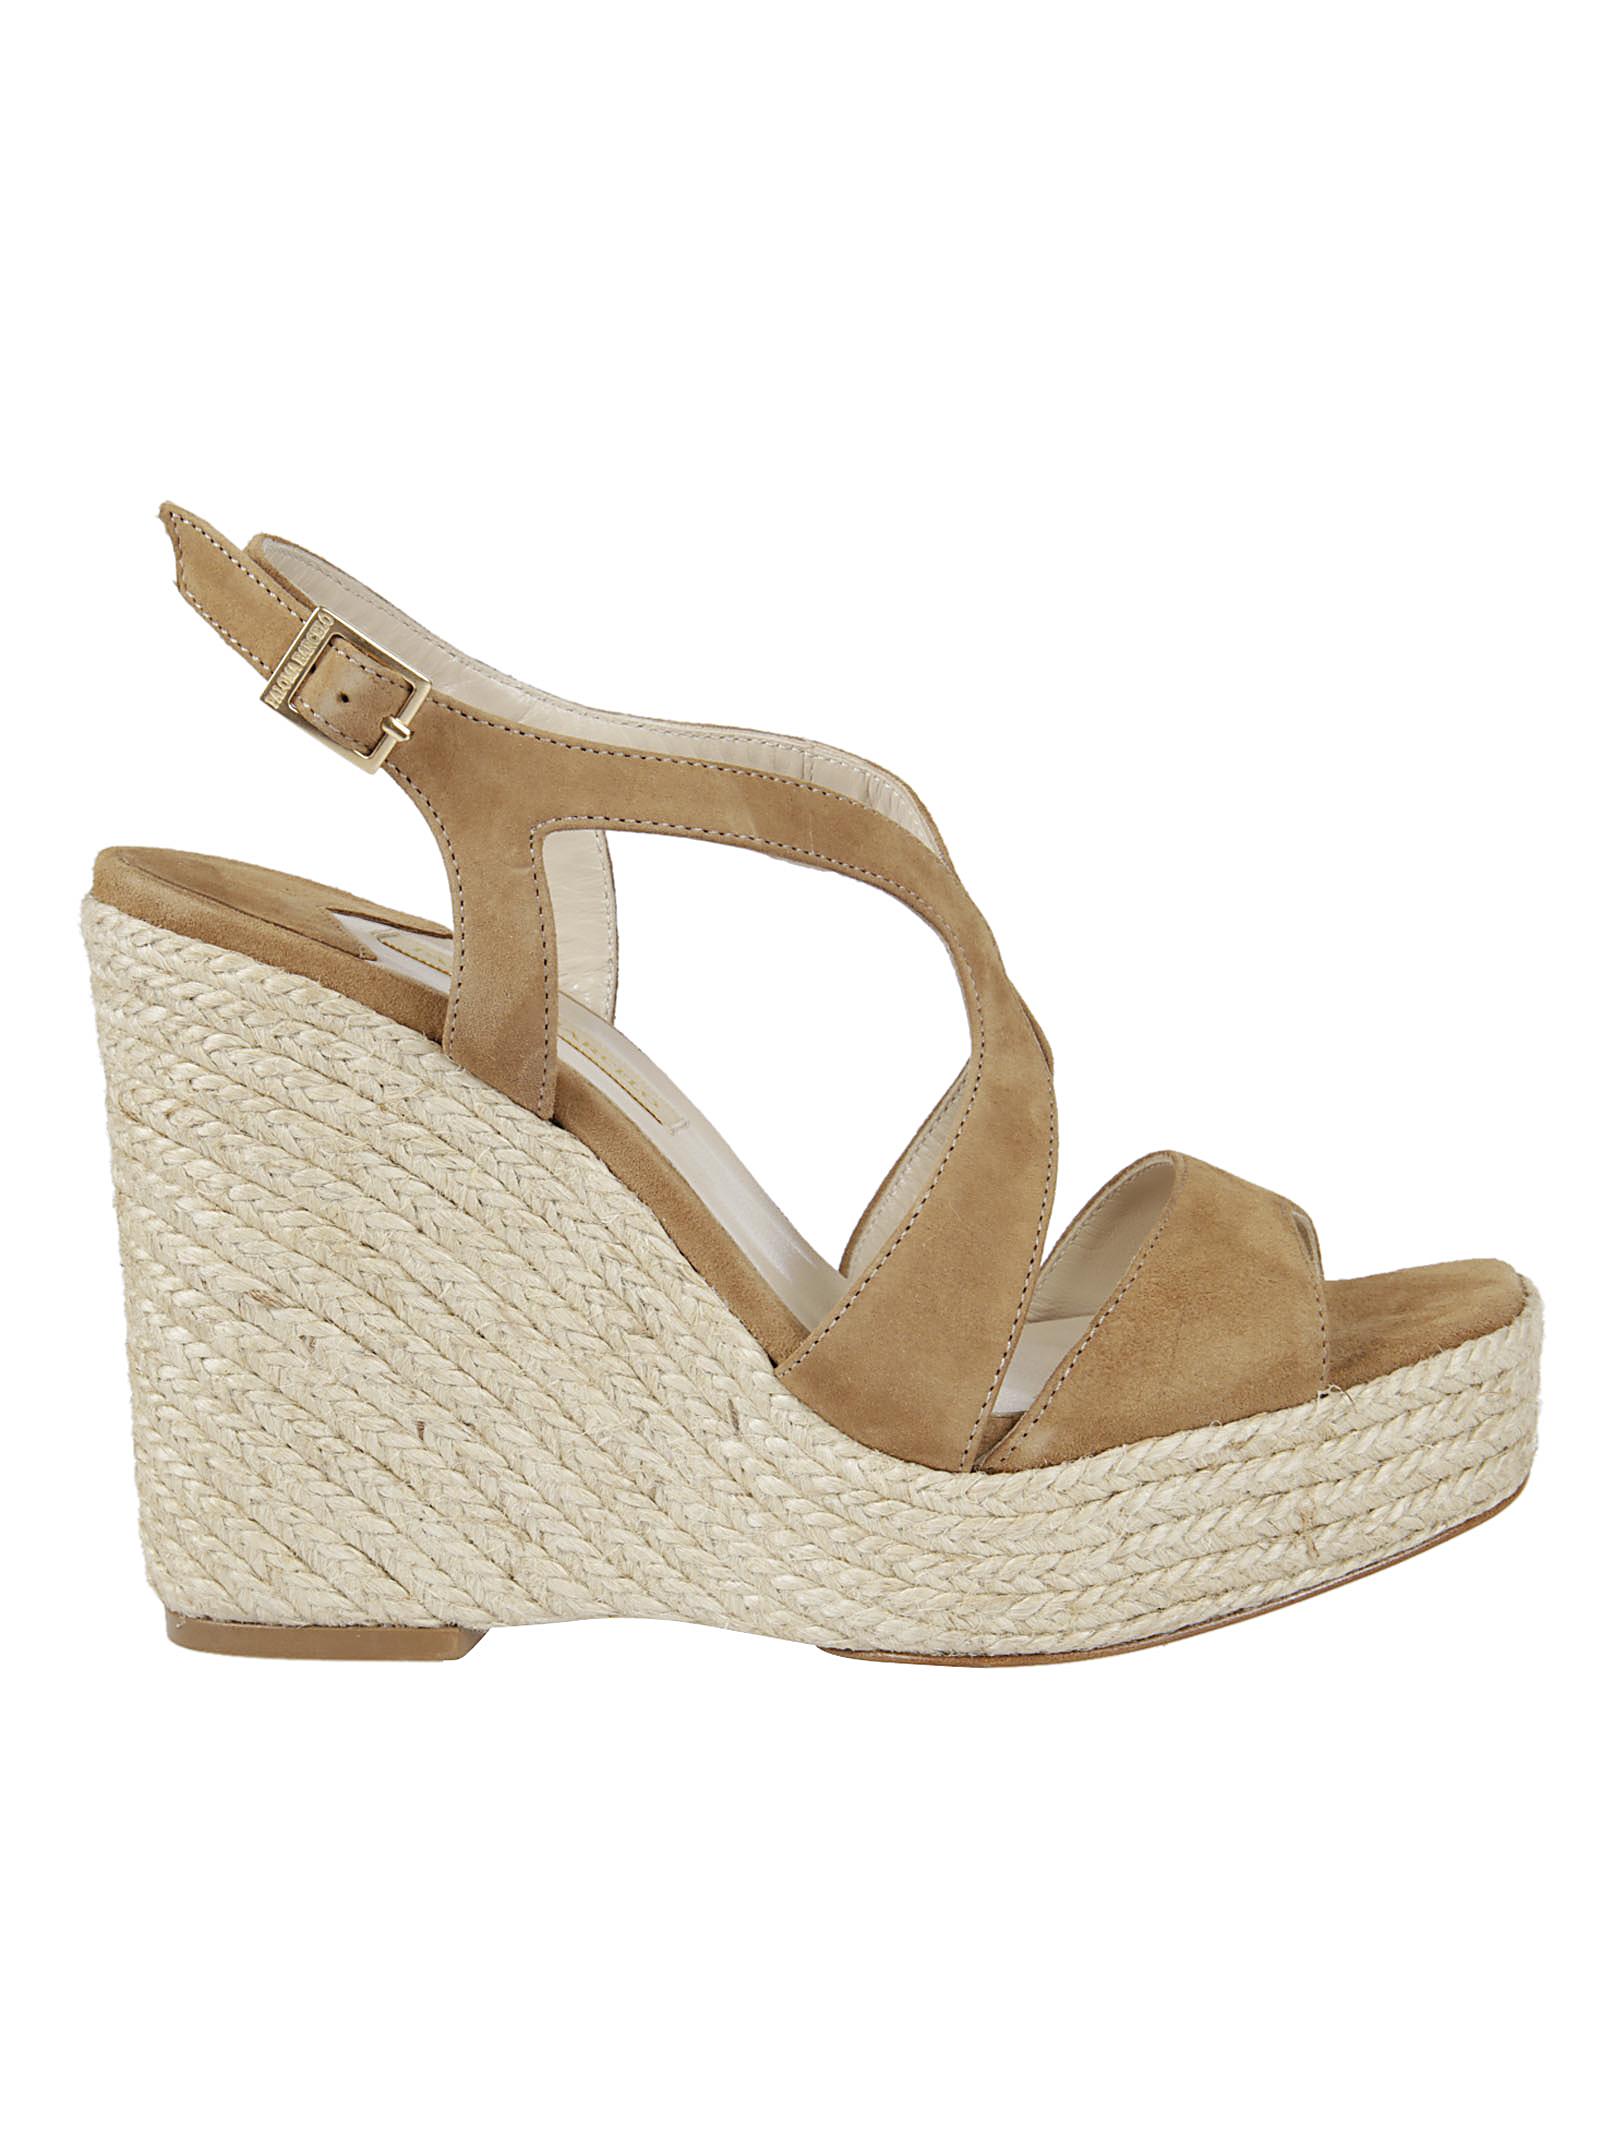 Paloma Barcelò Paloma Barceló Ankle Strap Wedge Sandals